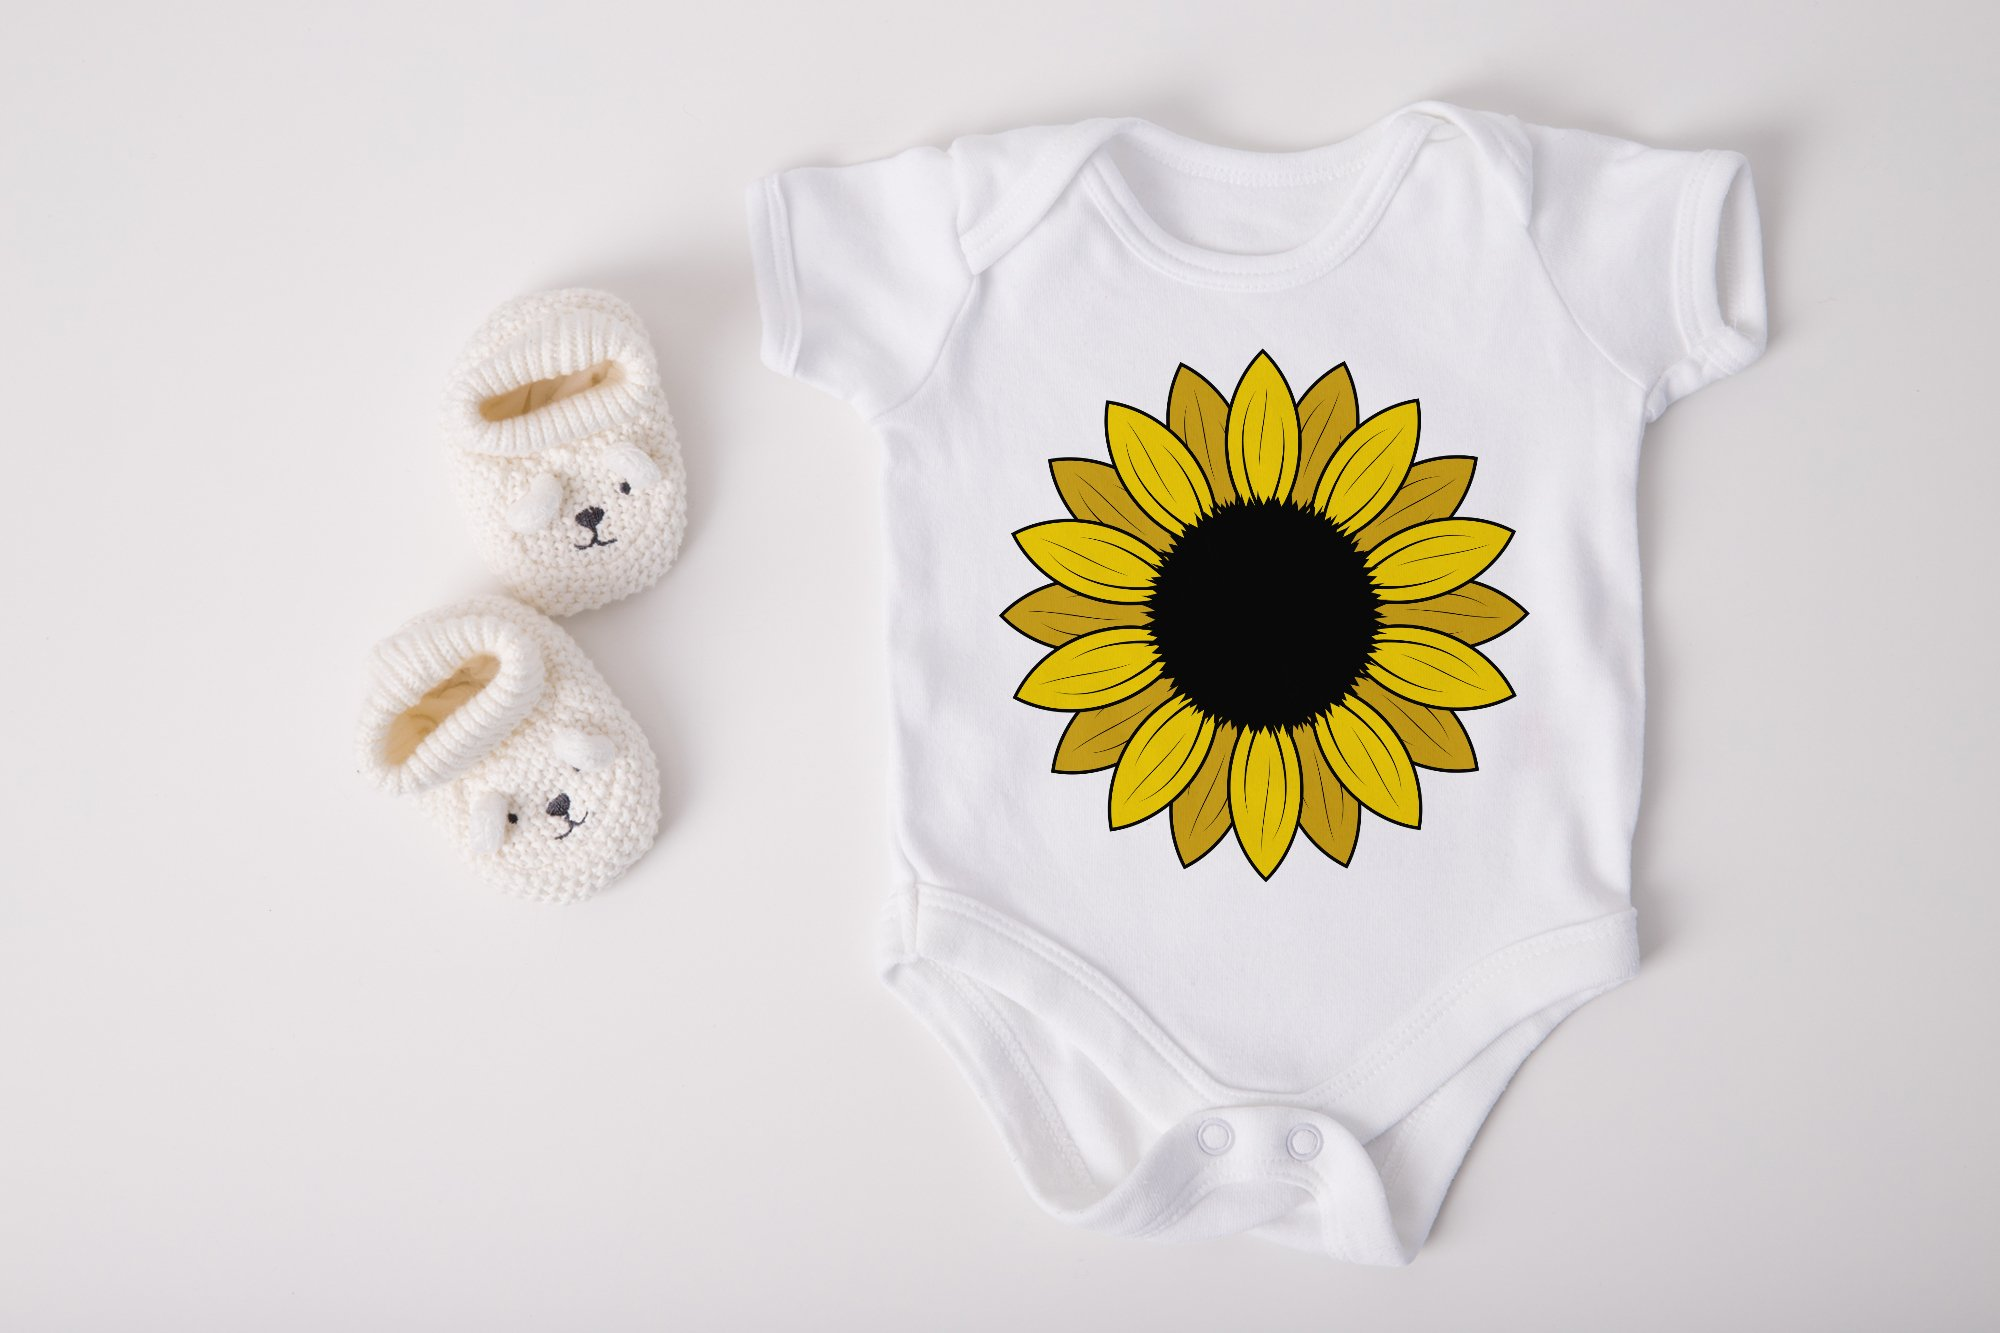 Sunflower SVG Bundle, Sunflower Clipart, Sunflower Monogram example image 5